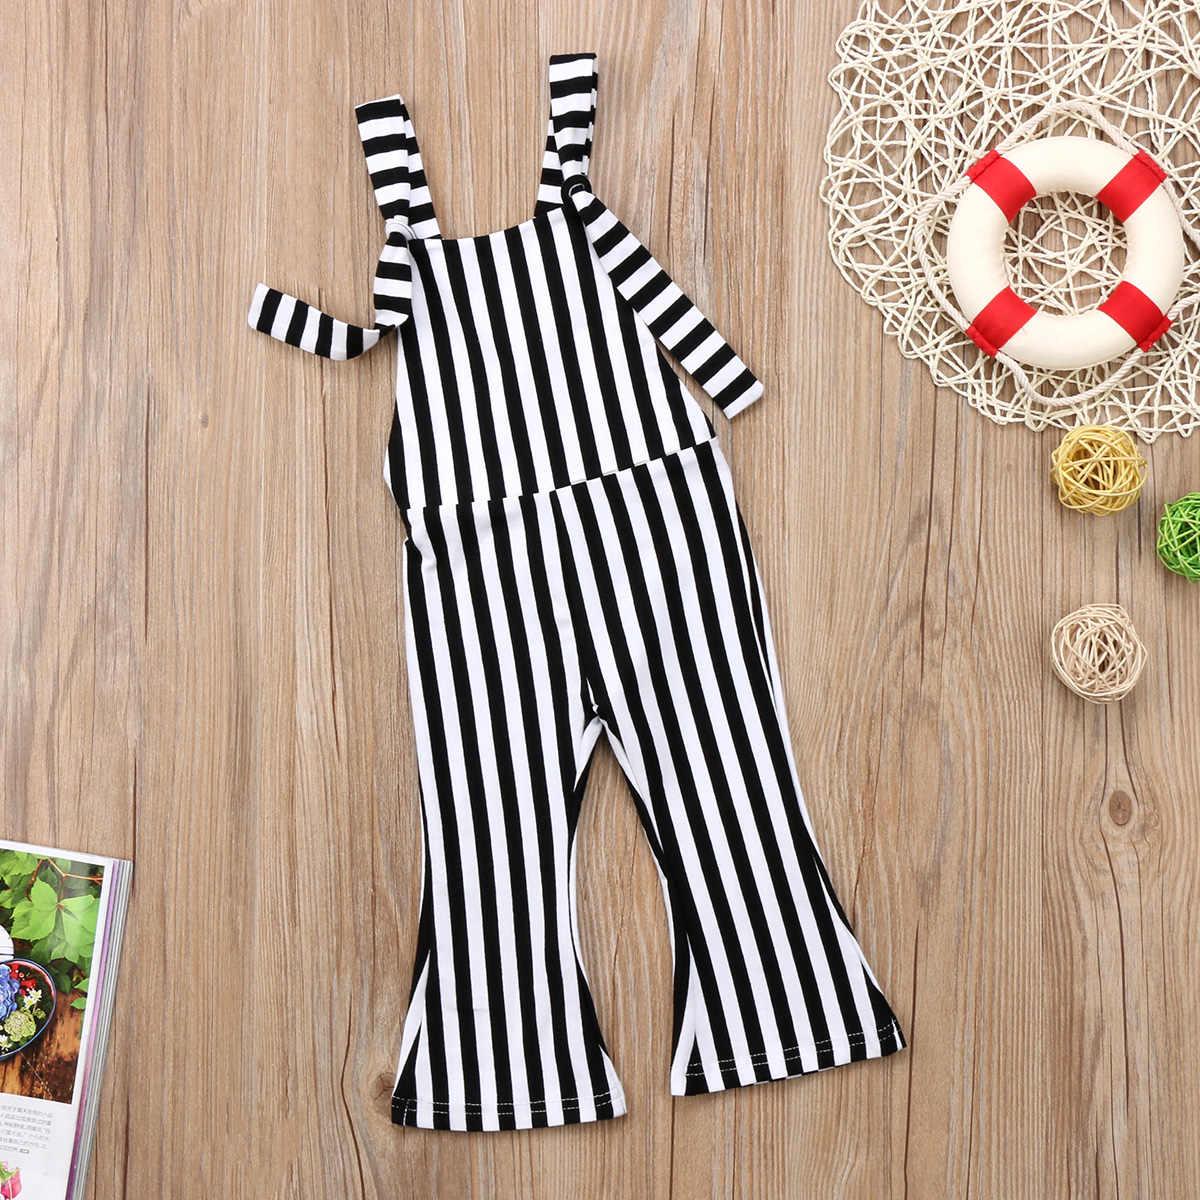 2018 nuevo niño Infante niños bebés niñas mono a rayas pantalones mameluco campana Bottoms trajes sin mangas 6 M-5 T